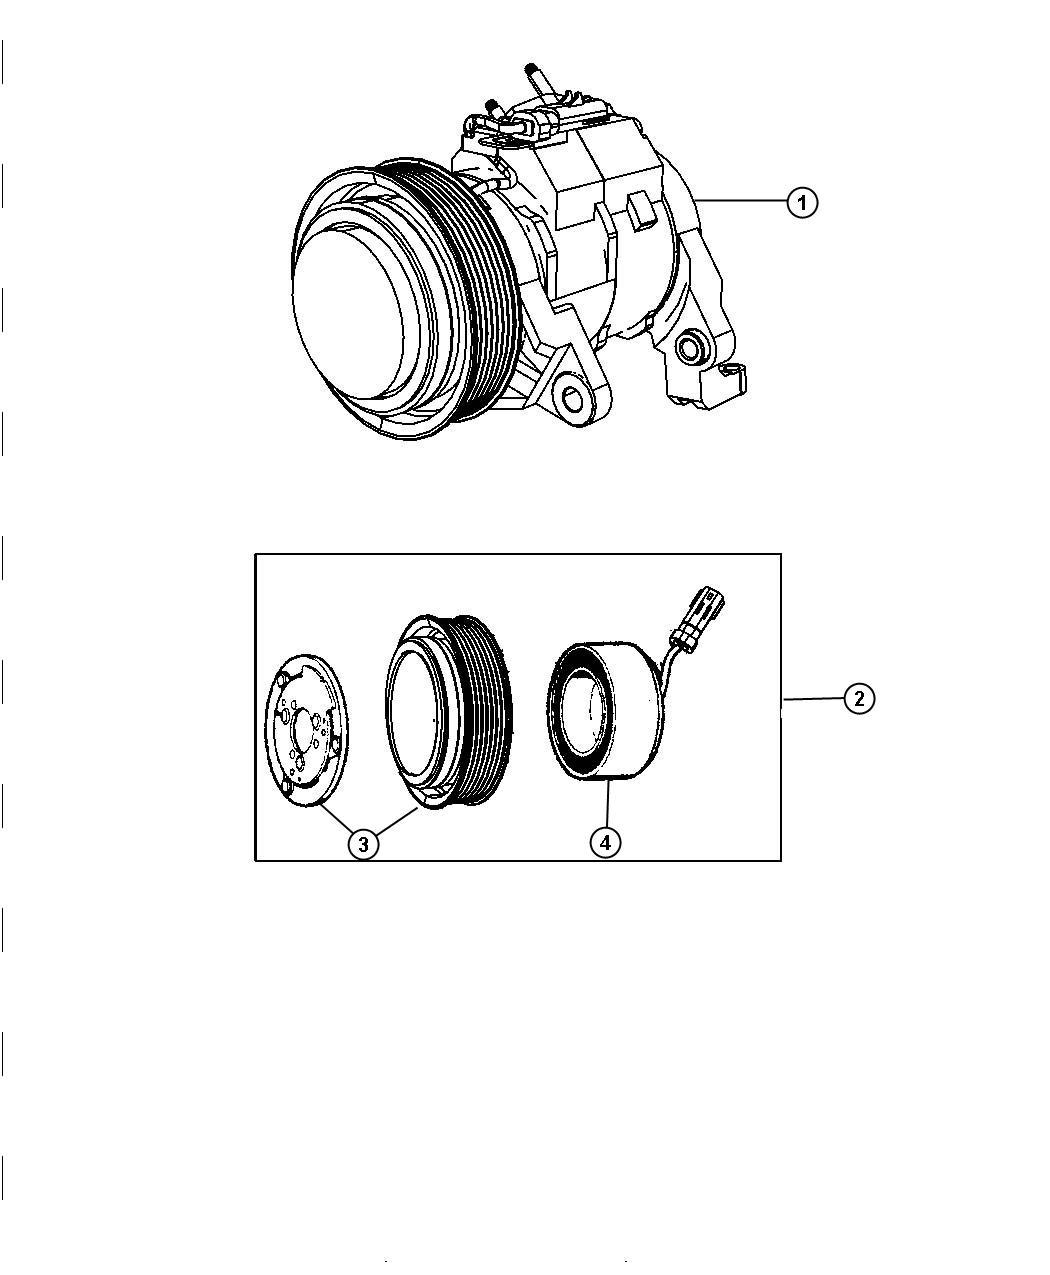 Dodge Ram Compressor Air Conditioning Wclutch